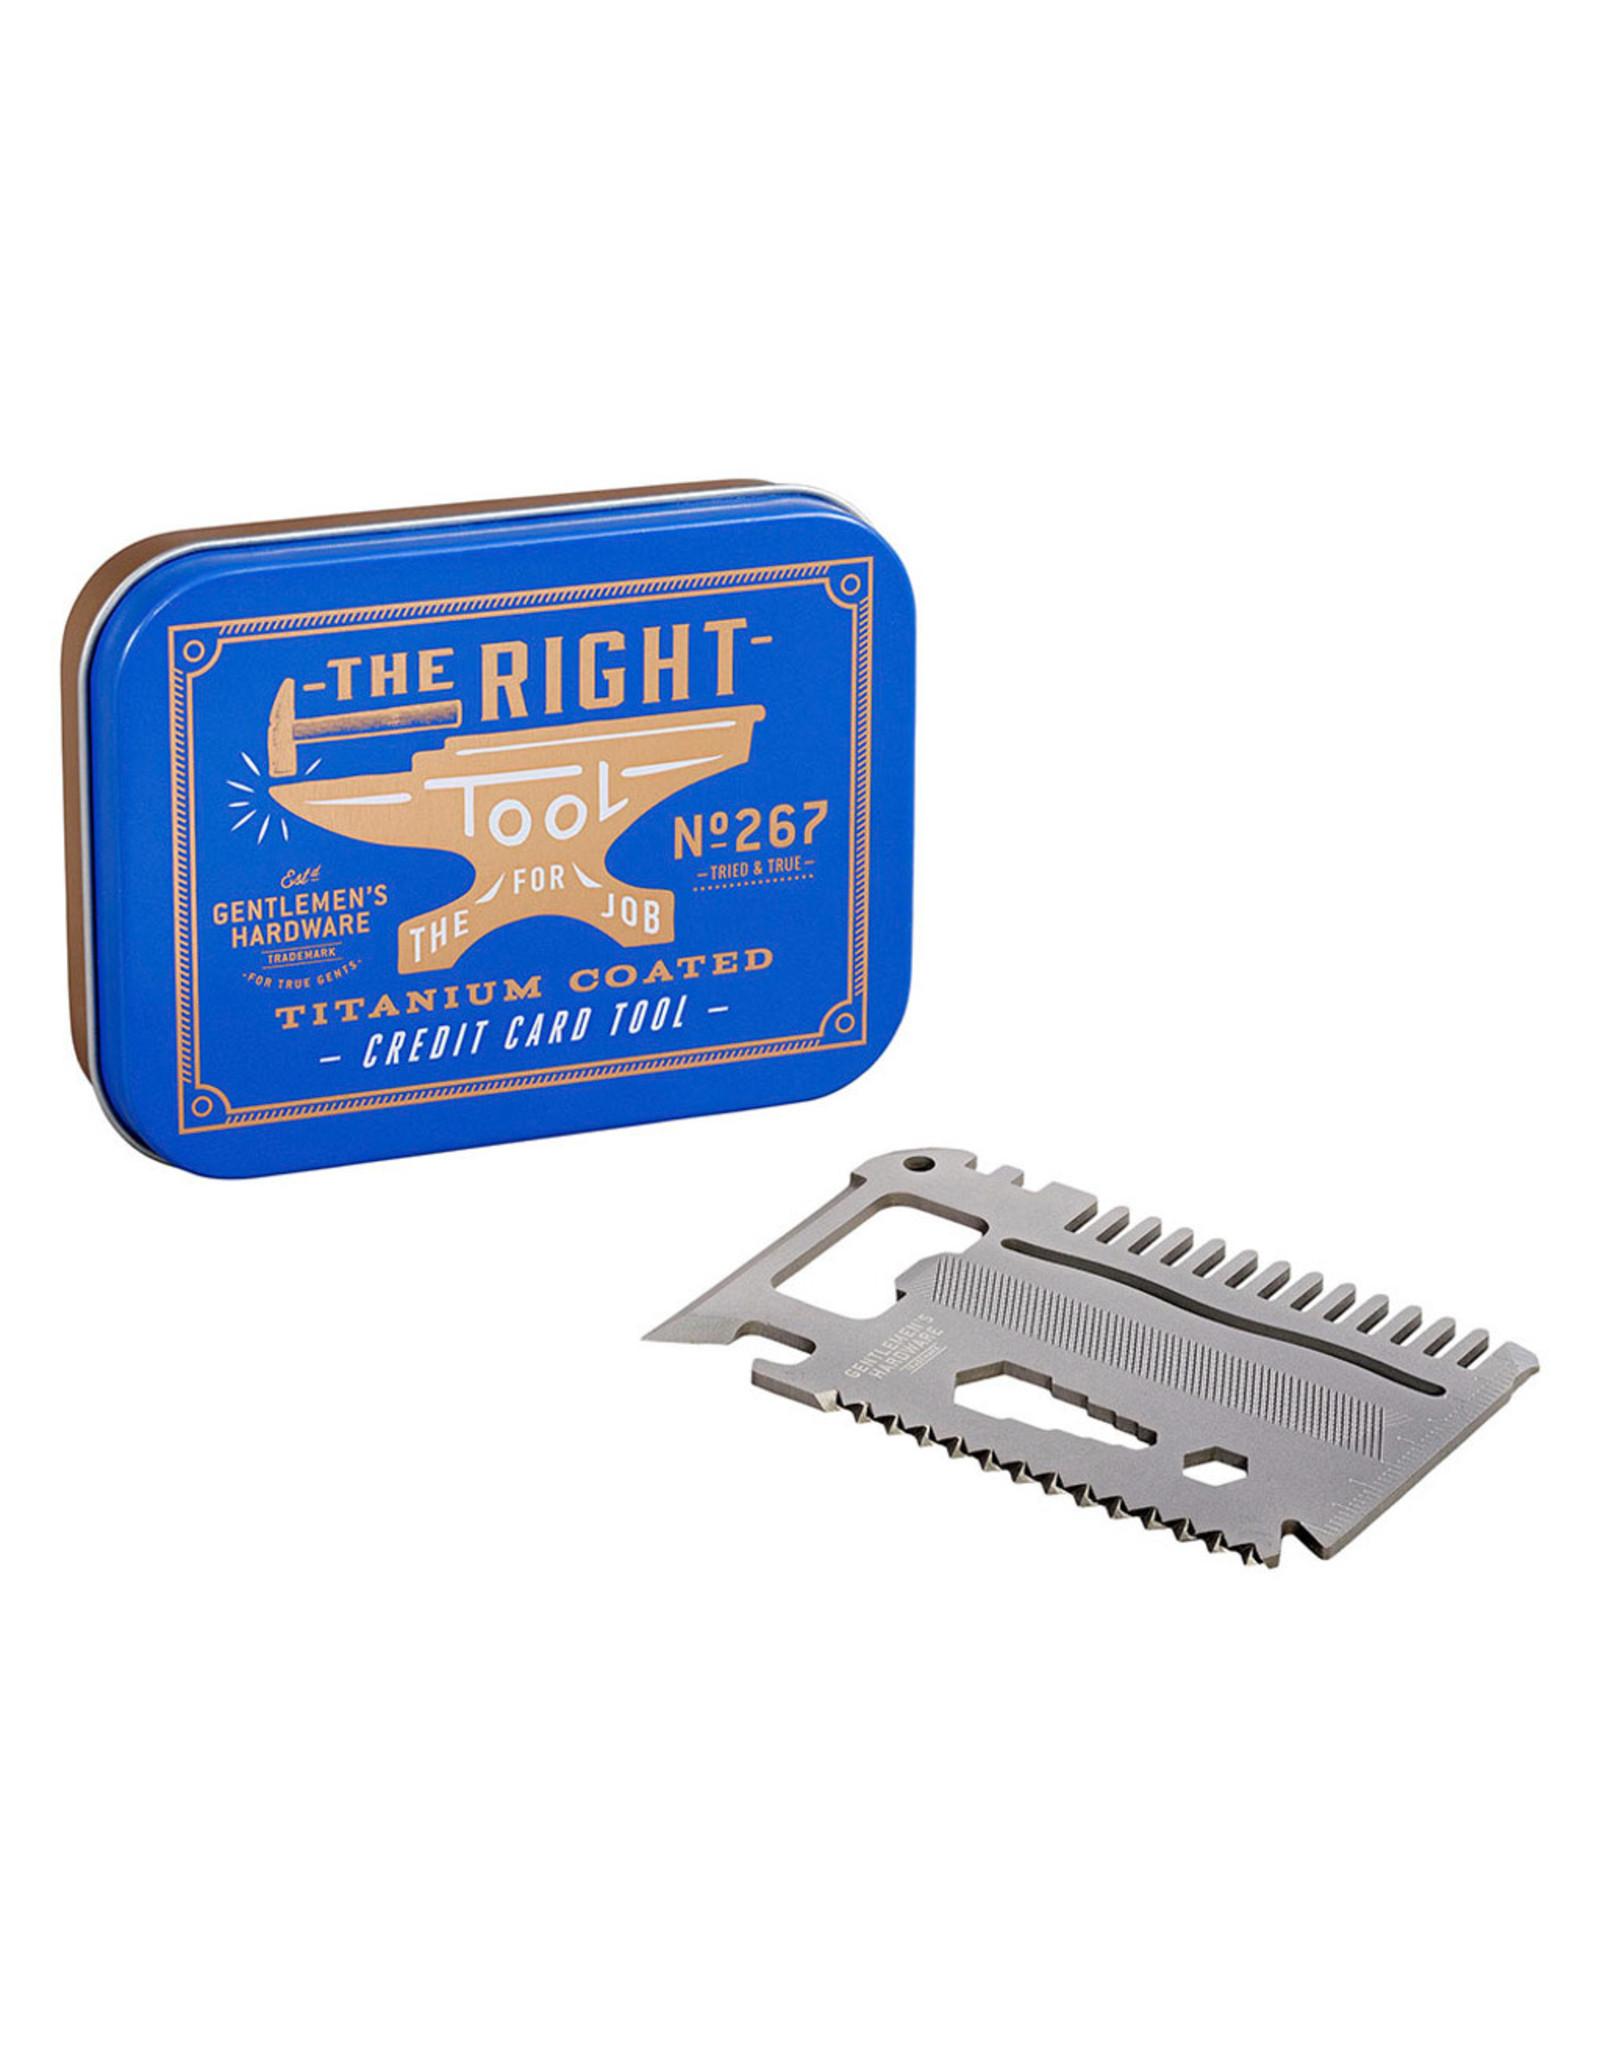 Gentlemen's Hardware Credit Card Tool Titanium